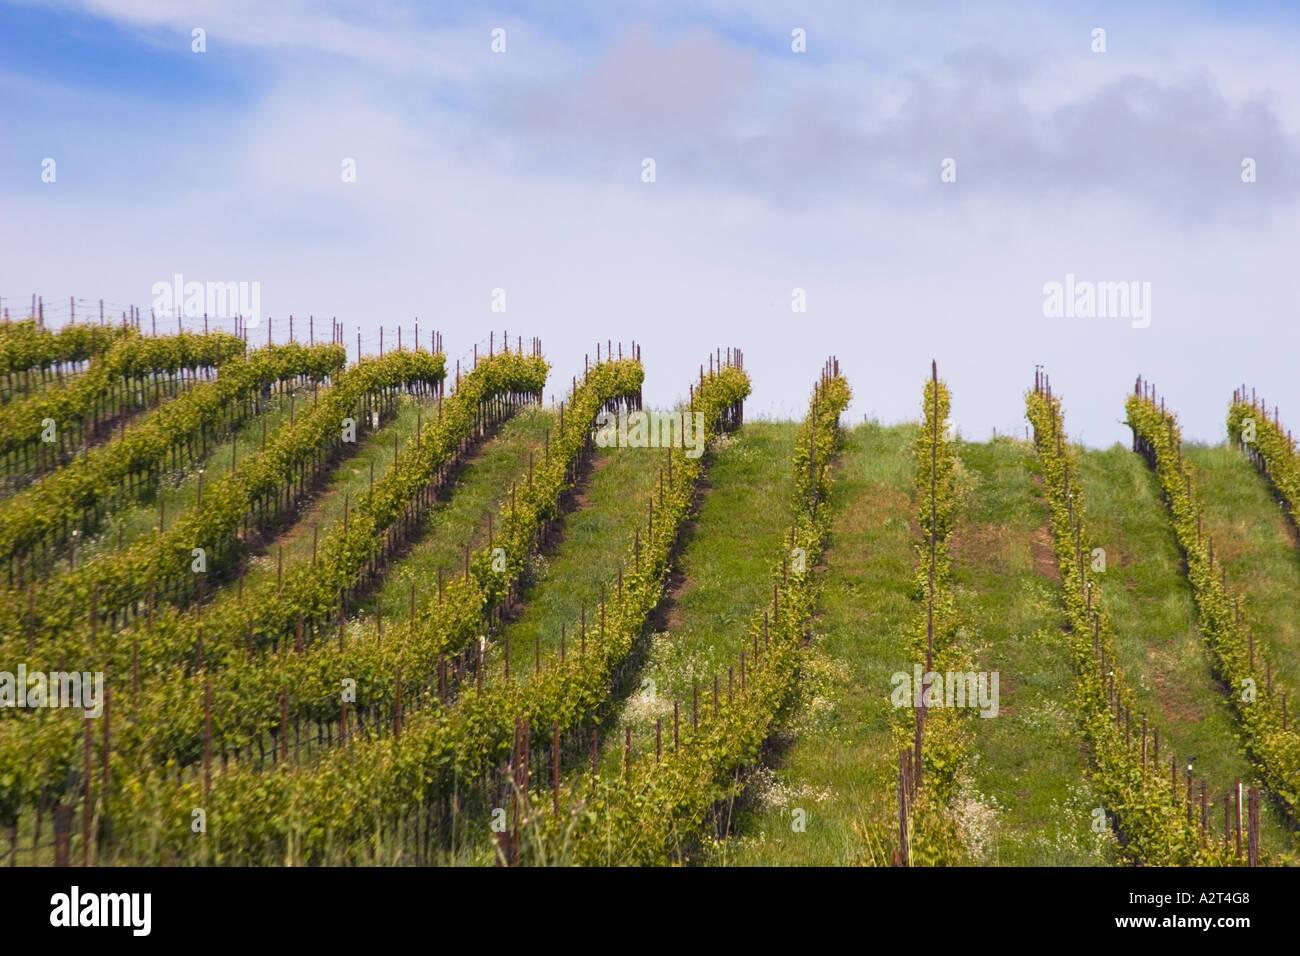 Vineyard in Sonoma County, California, United States of AmericaStock Photo